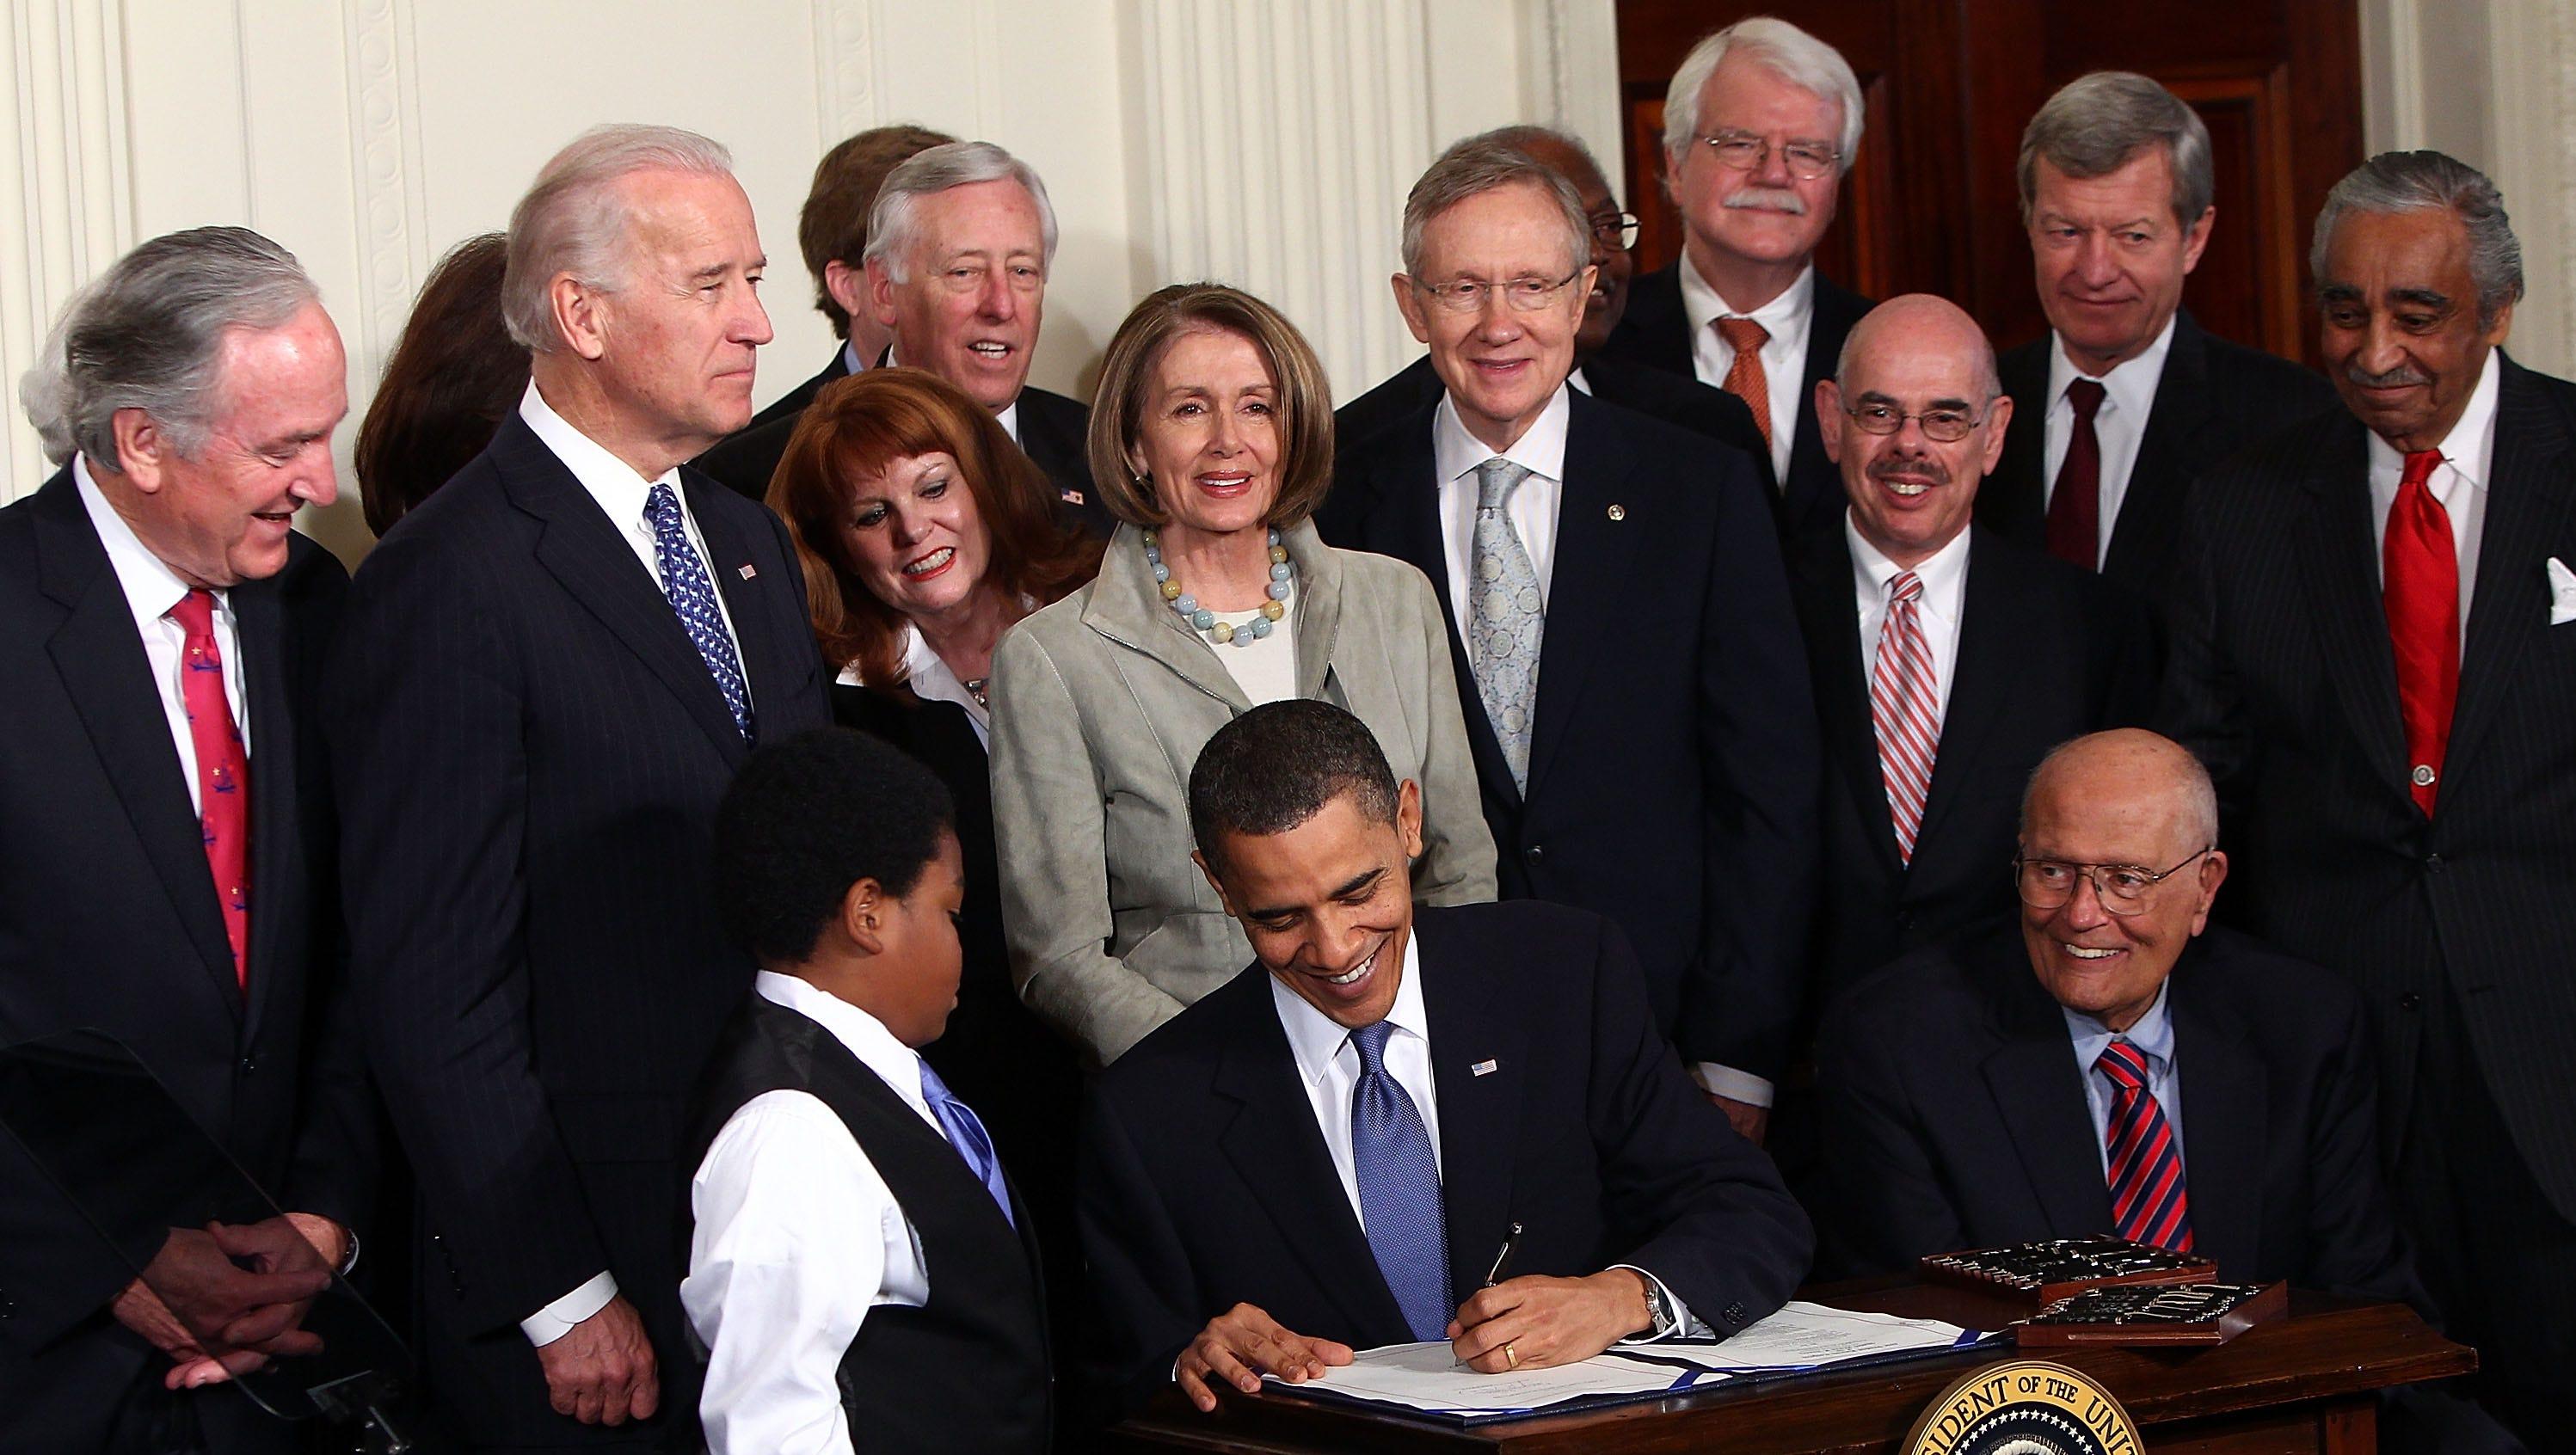 Image result for obama care 2010 images